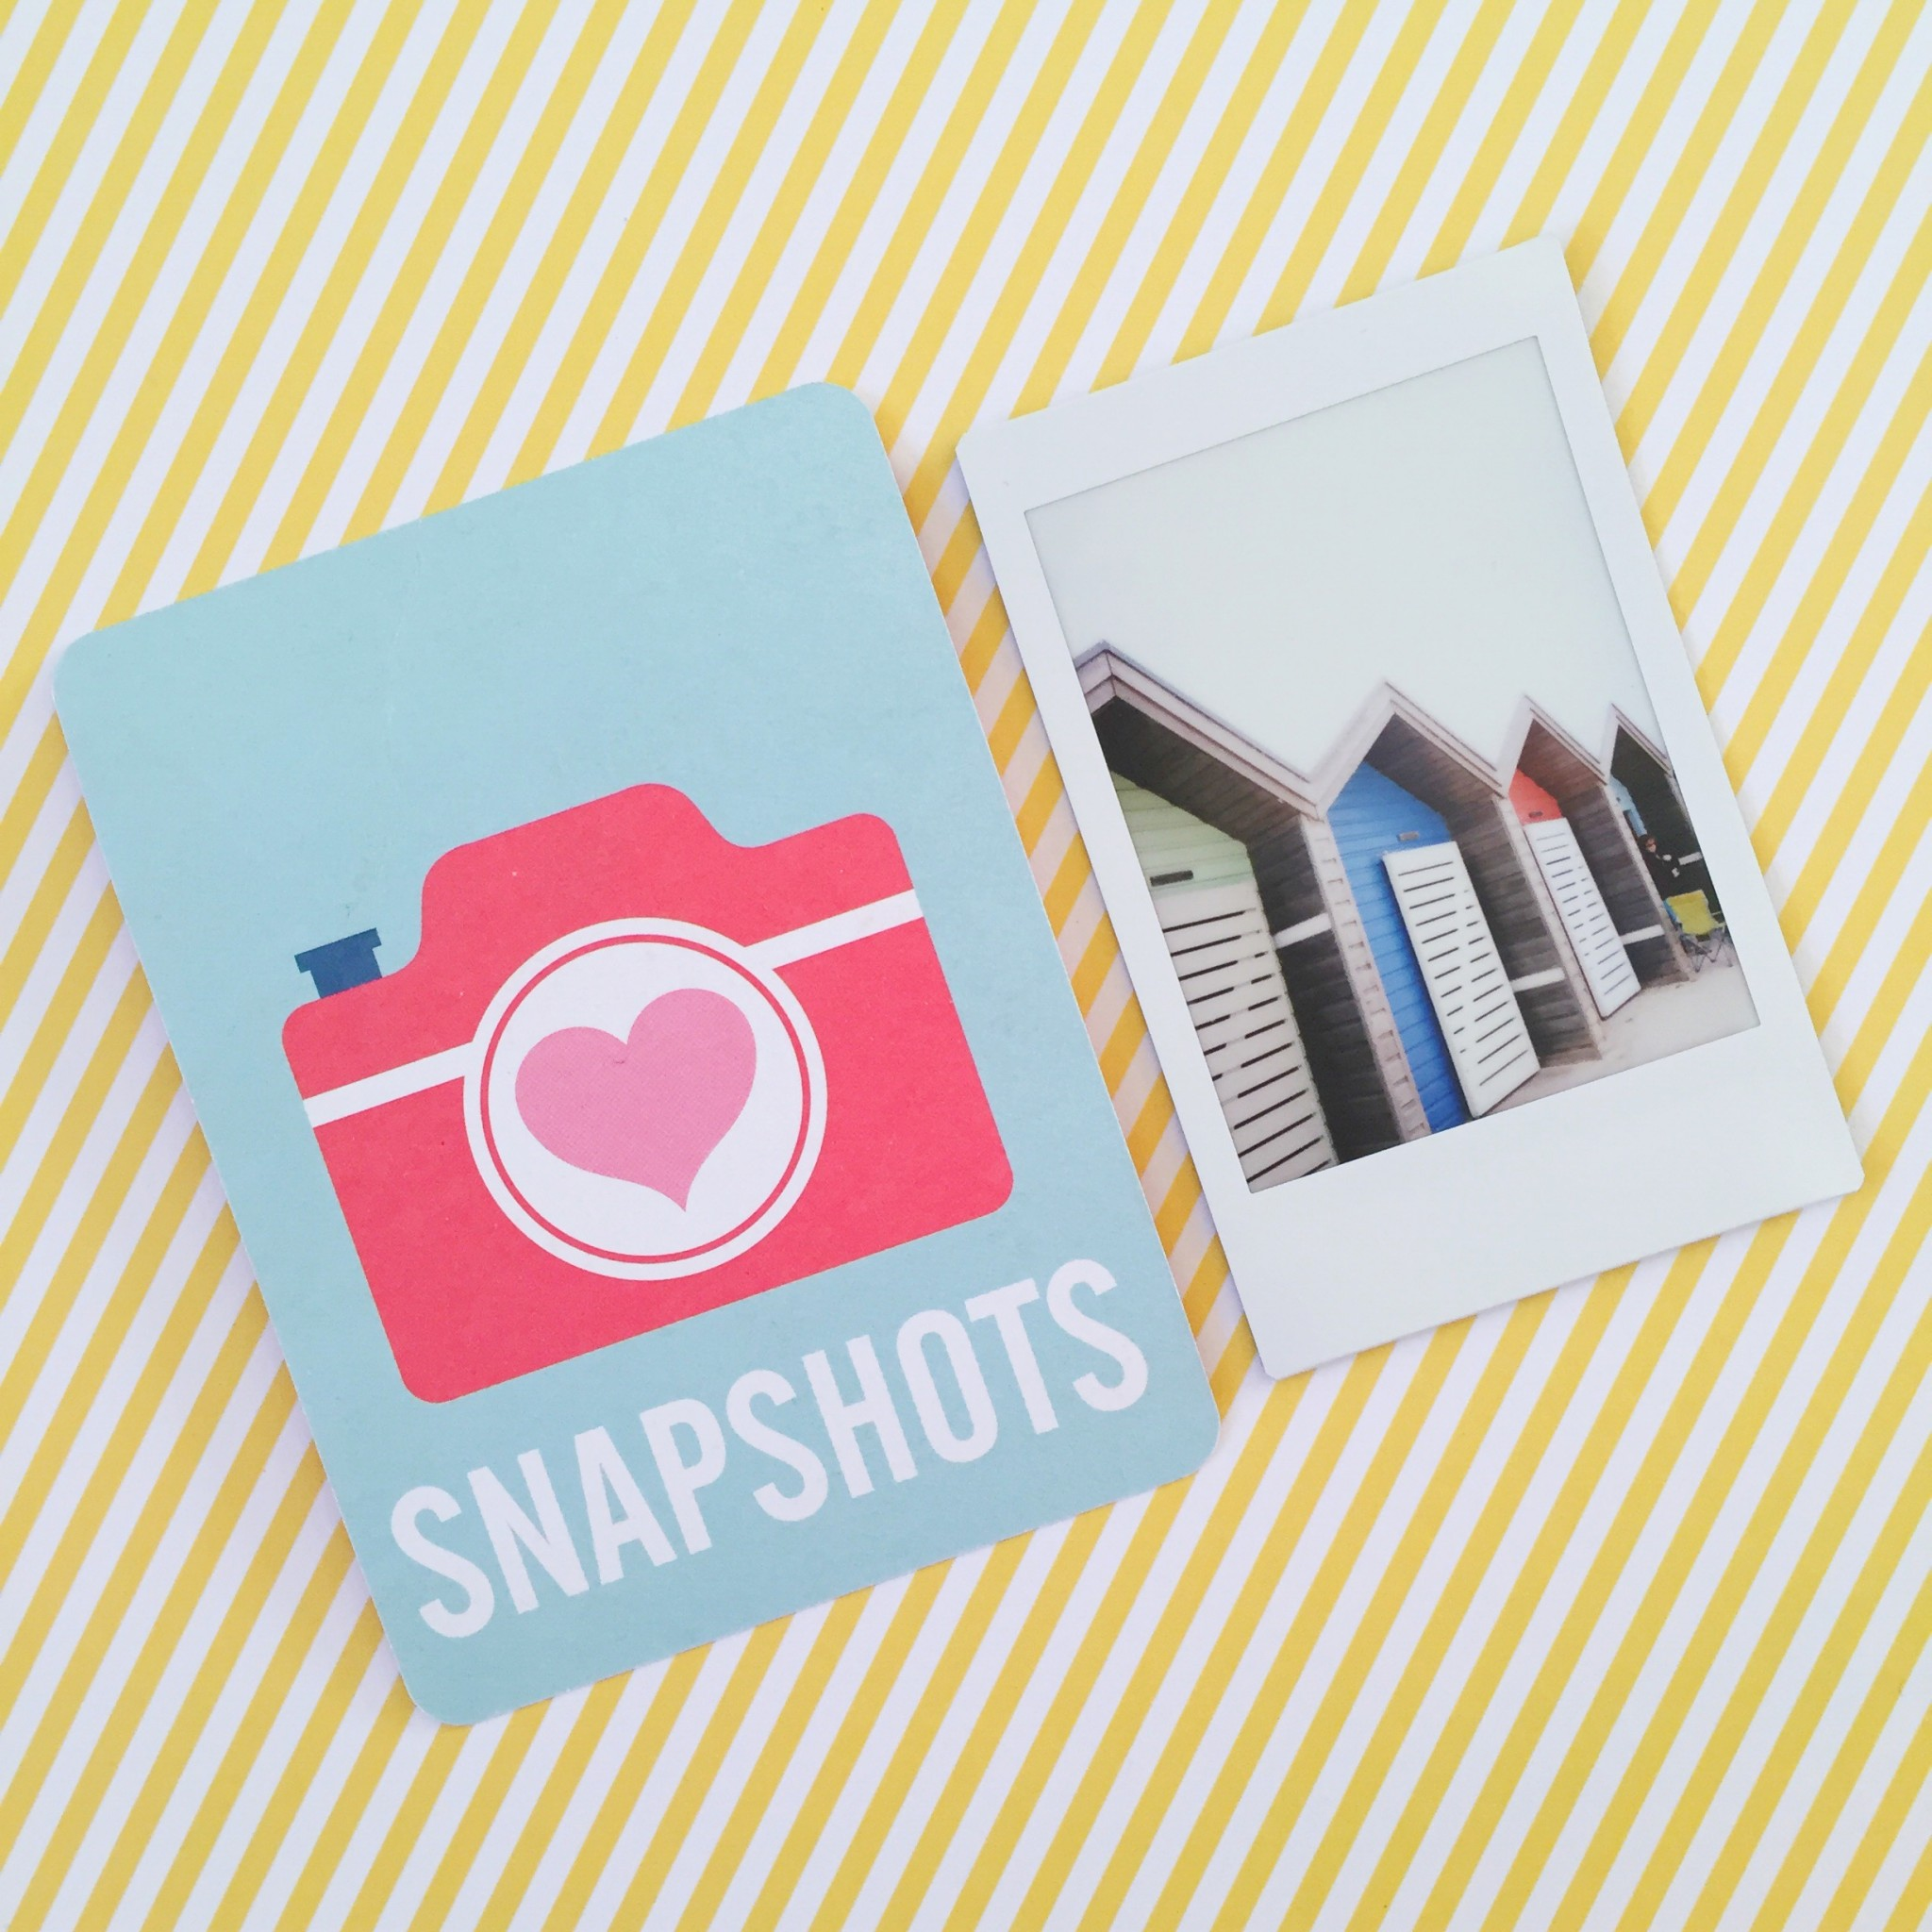 Summer polaroid pictures beach huts | Hello! Hooray!